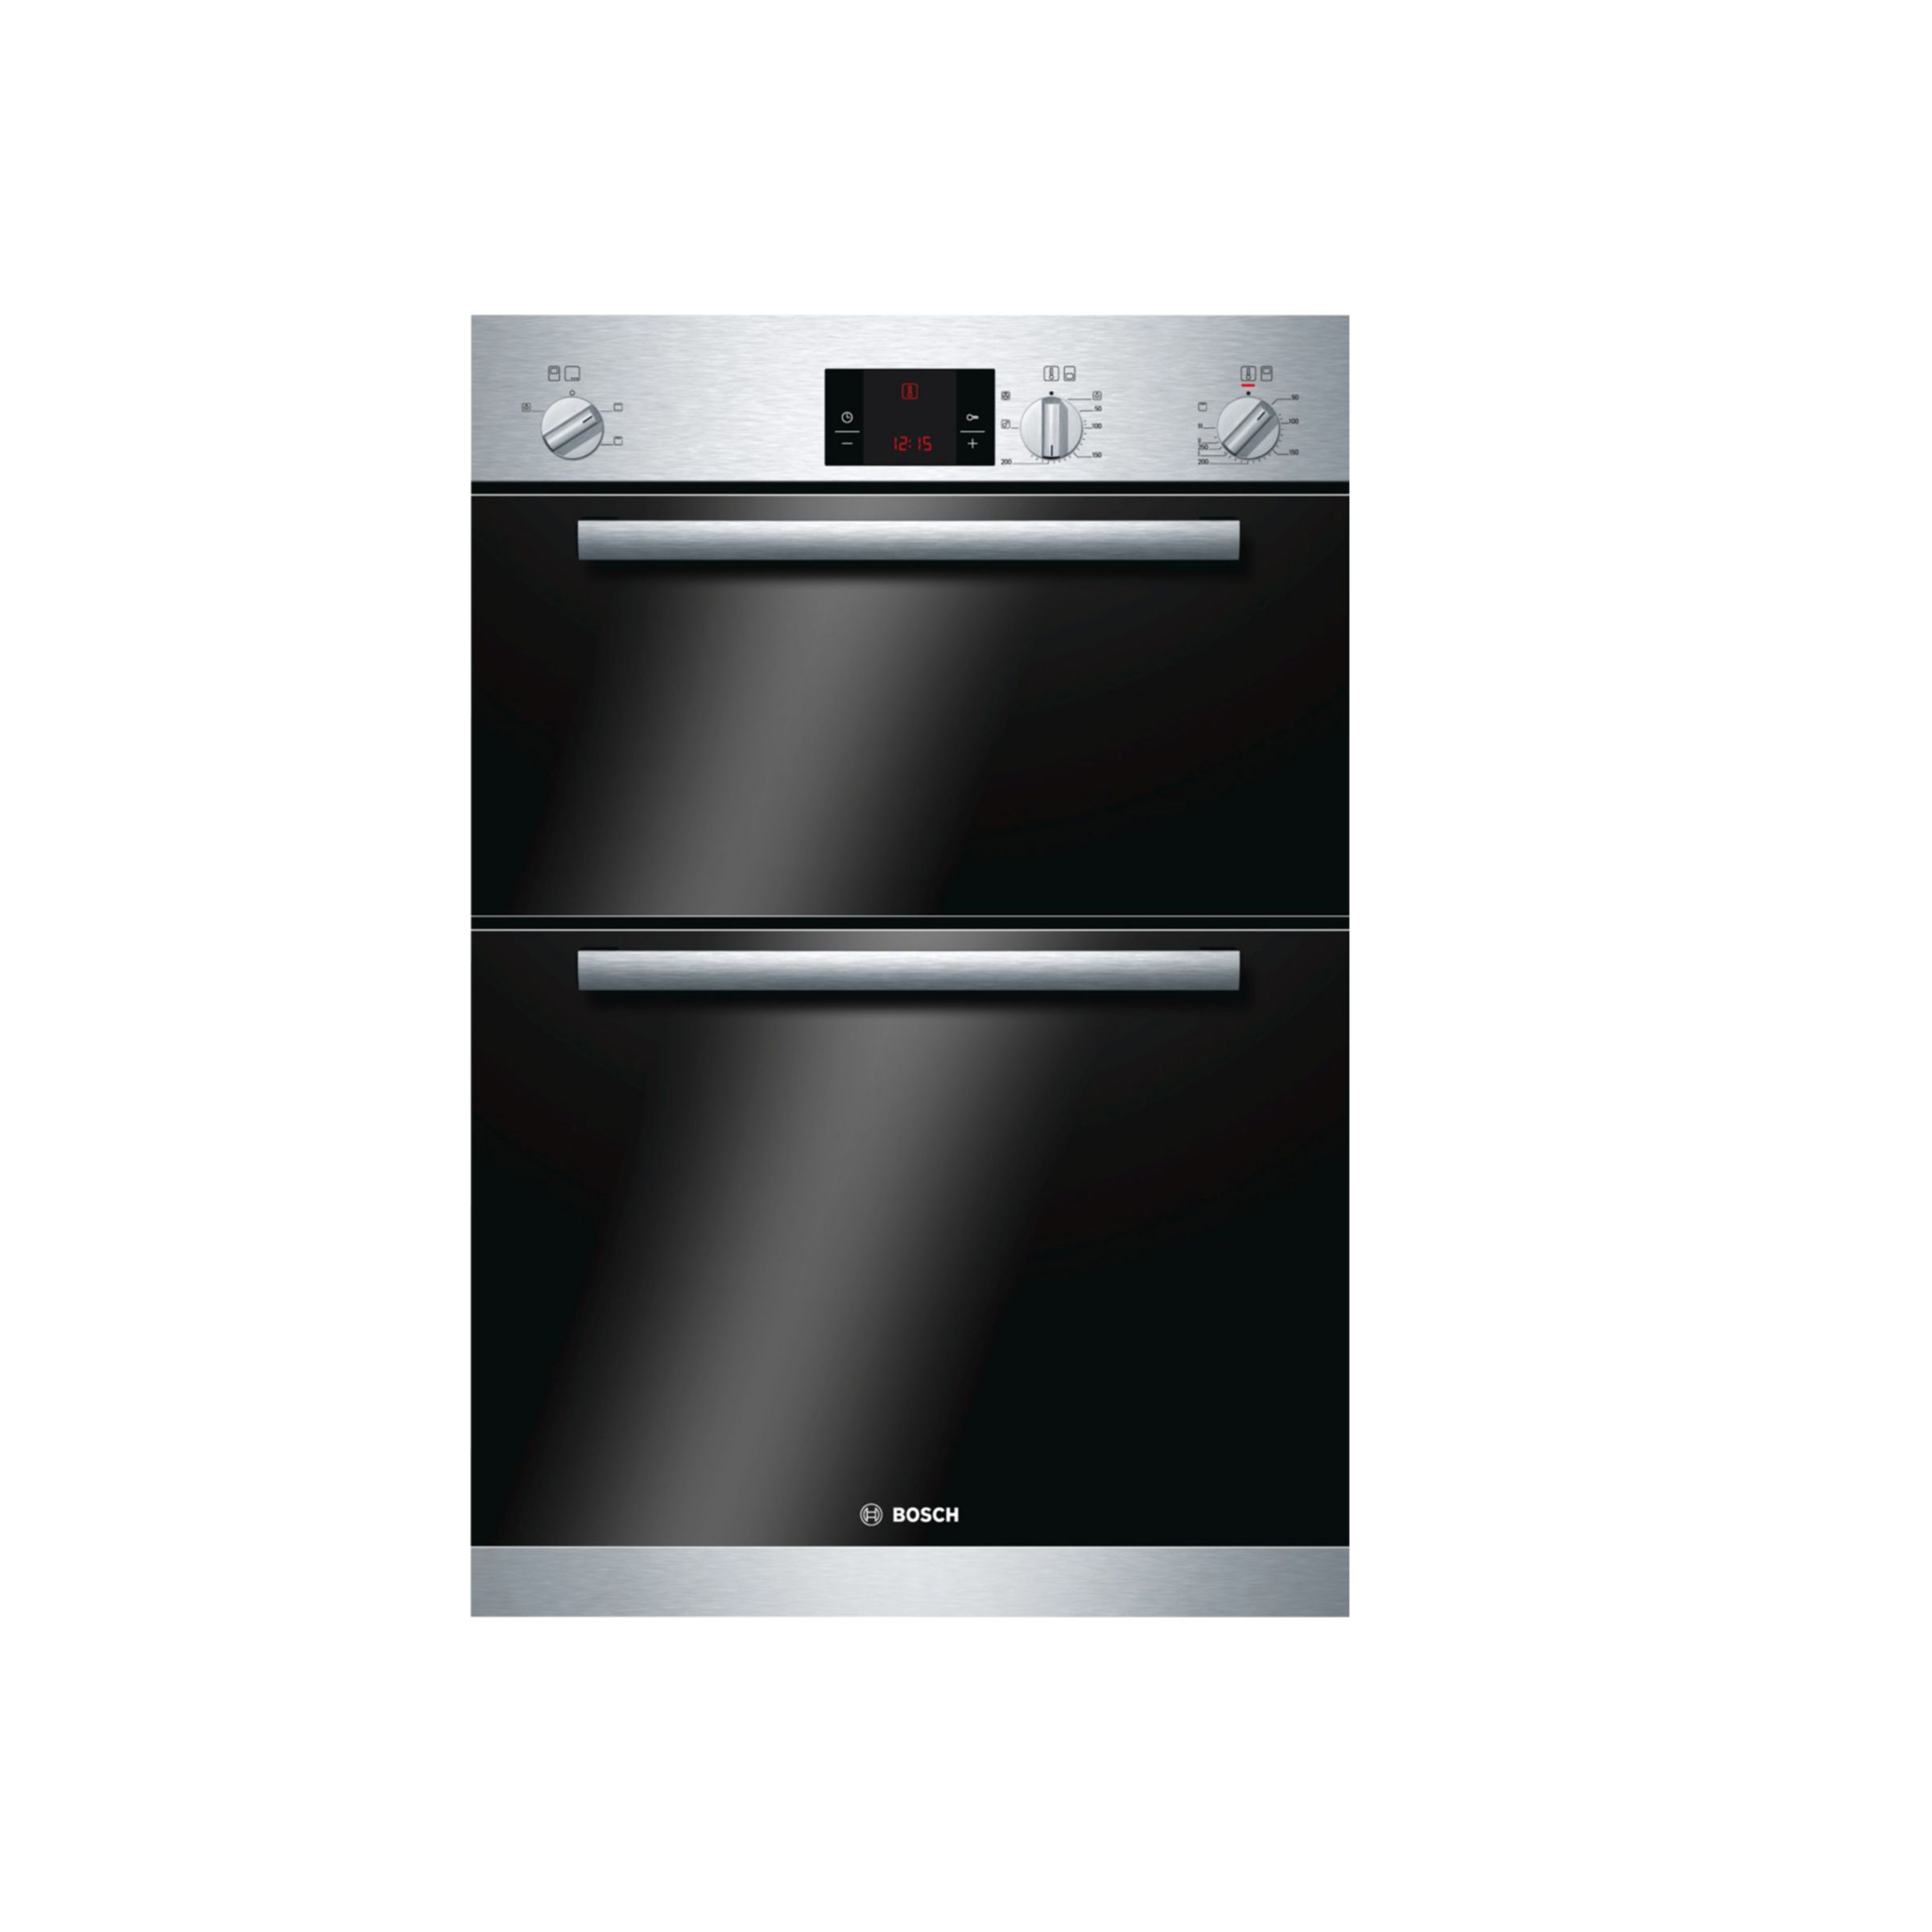 Black oven gloves john lewis - Buy Bosch Hbm13b151b Built In Double Electric Oven Brushed Steel Online At Johnlewis